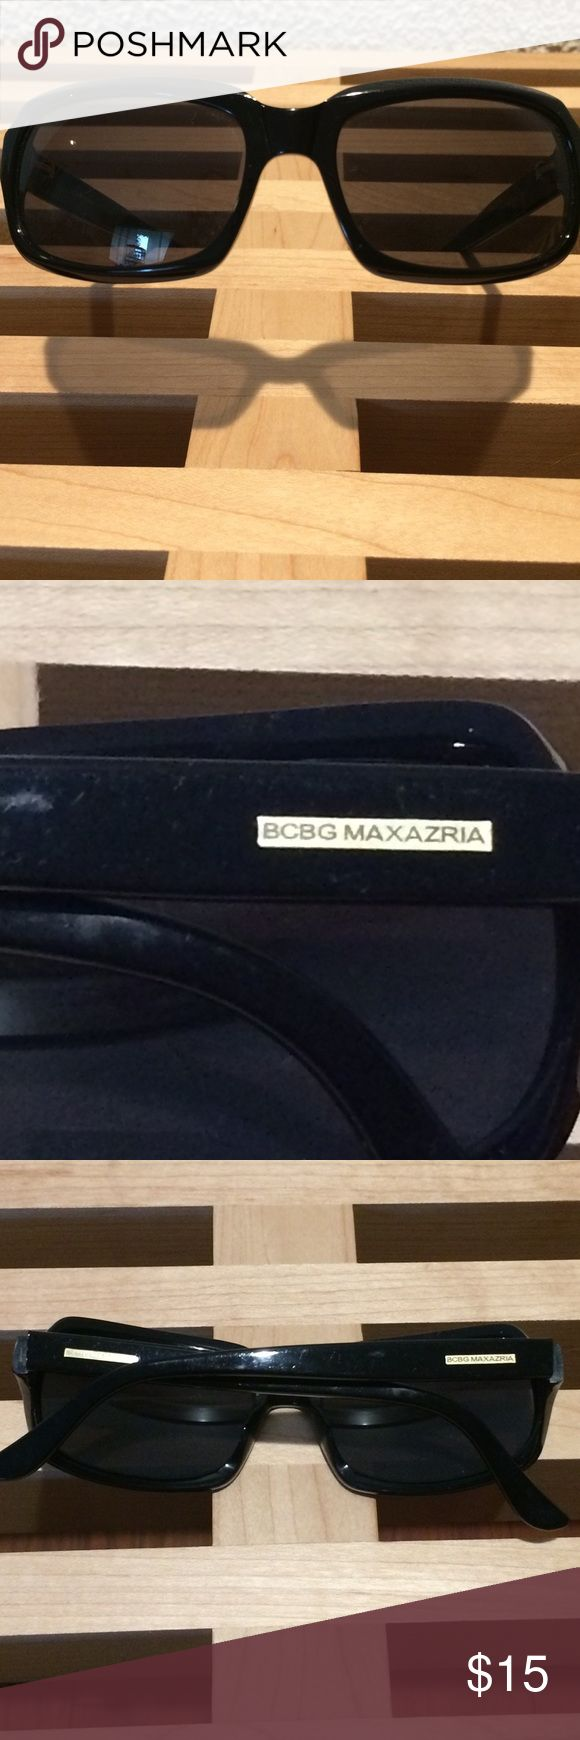 BCBG Max Azria sunglasses 😎 BCBG Max Azria sunglasses BCBGMaxAzria Accessories Sunglasses